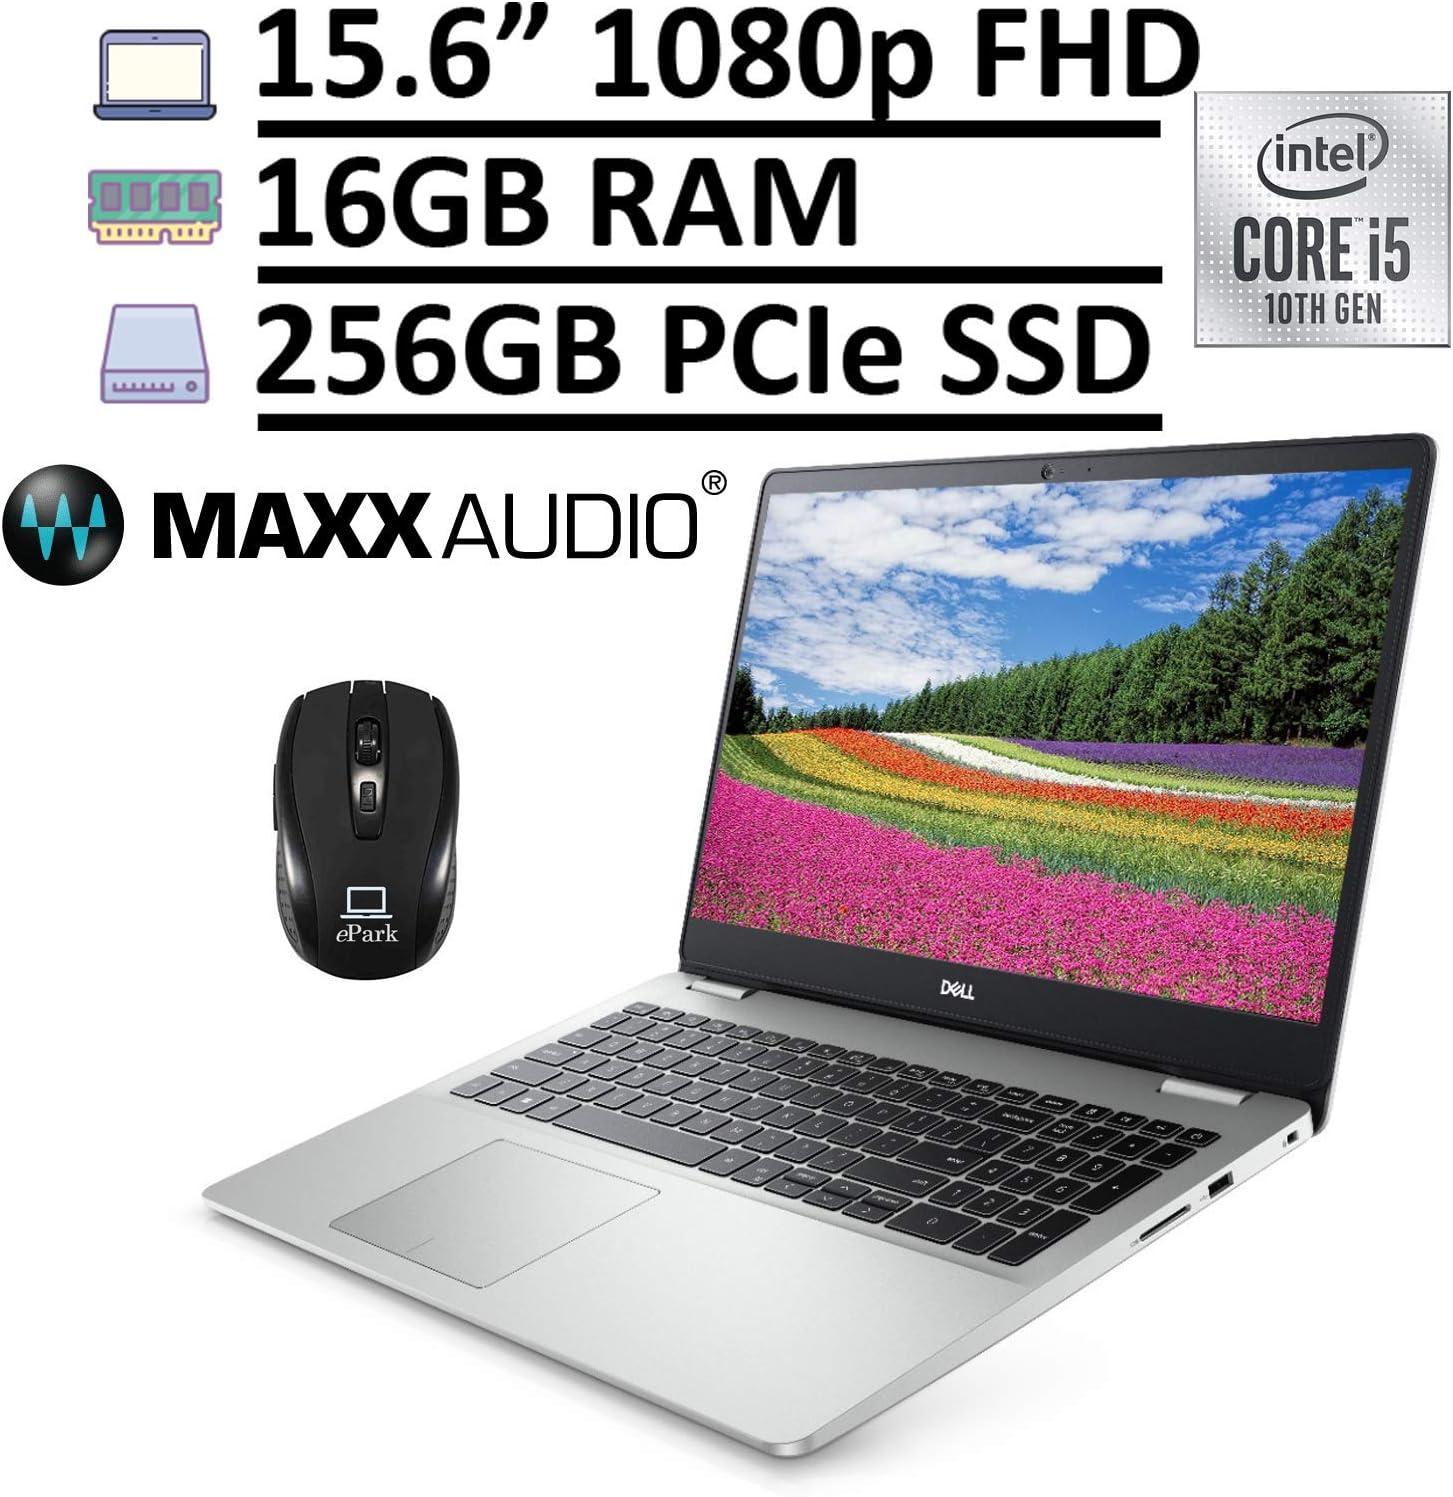 "2020 Dell Inspiron 15 5000 5594 Laptop, 15.6"" FHD Anti-Glare, 10th Gen Intel Core i5-10210U (Beats i7-7567U) 16GB RAM 256GB PCIe SSD, MaxxAudio Pro Backlit Keyboard Win 10 + ePark Wireless Mouse"